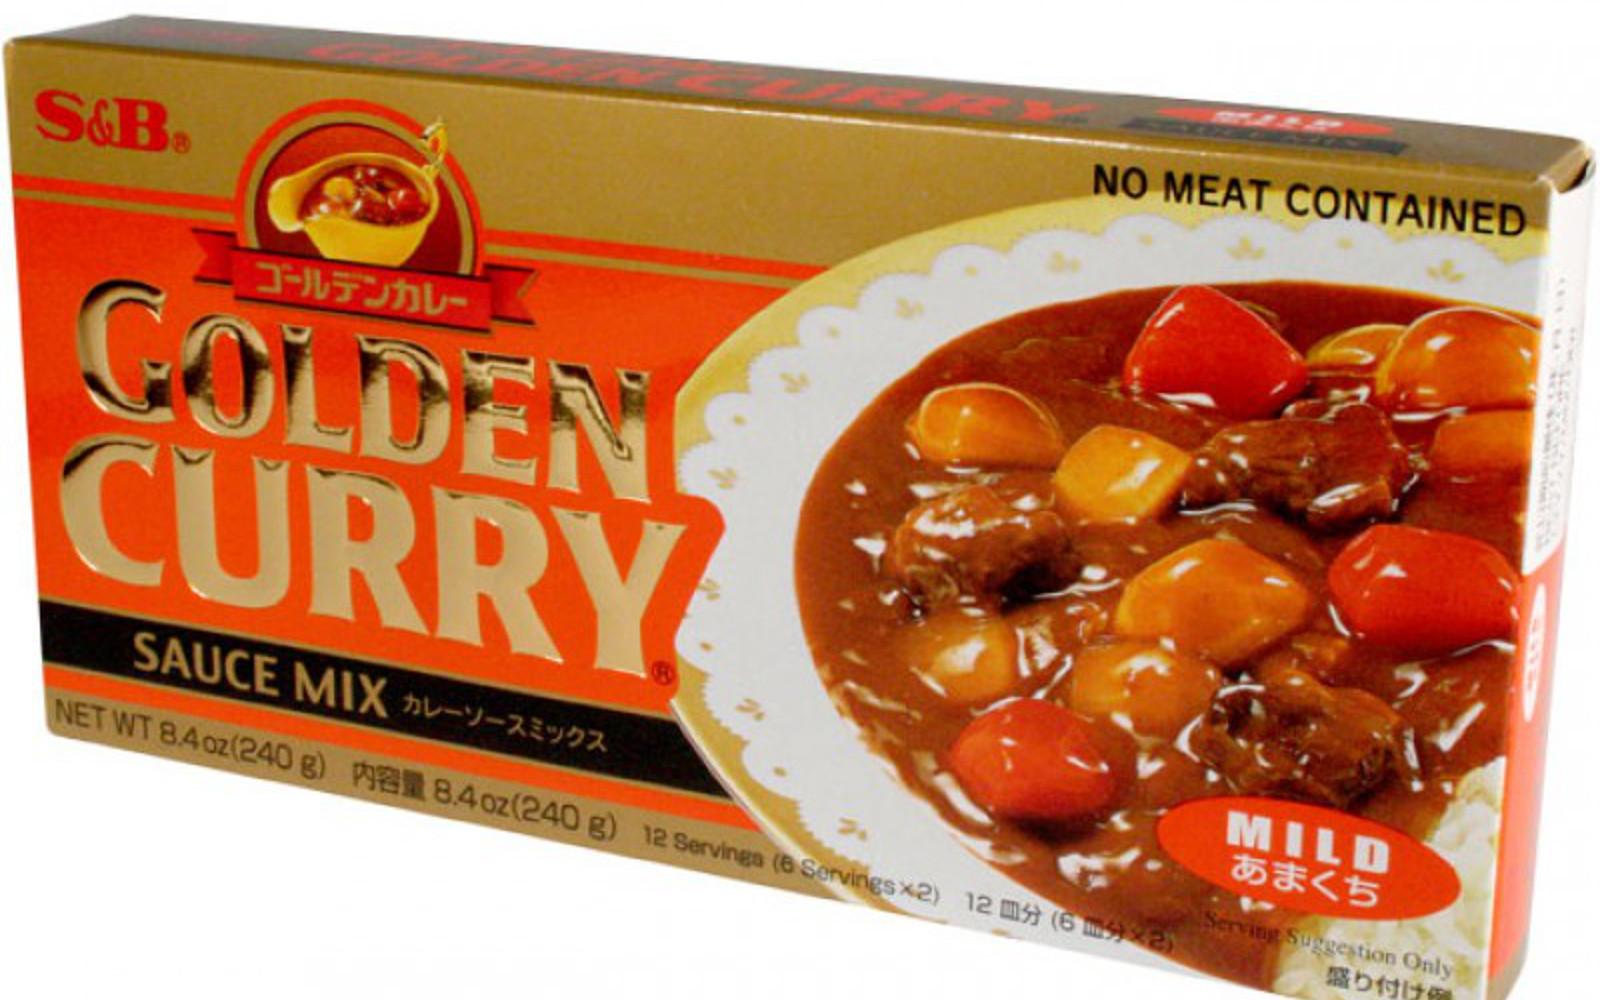 S&B Golden Curry Sauce Mix